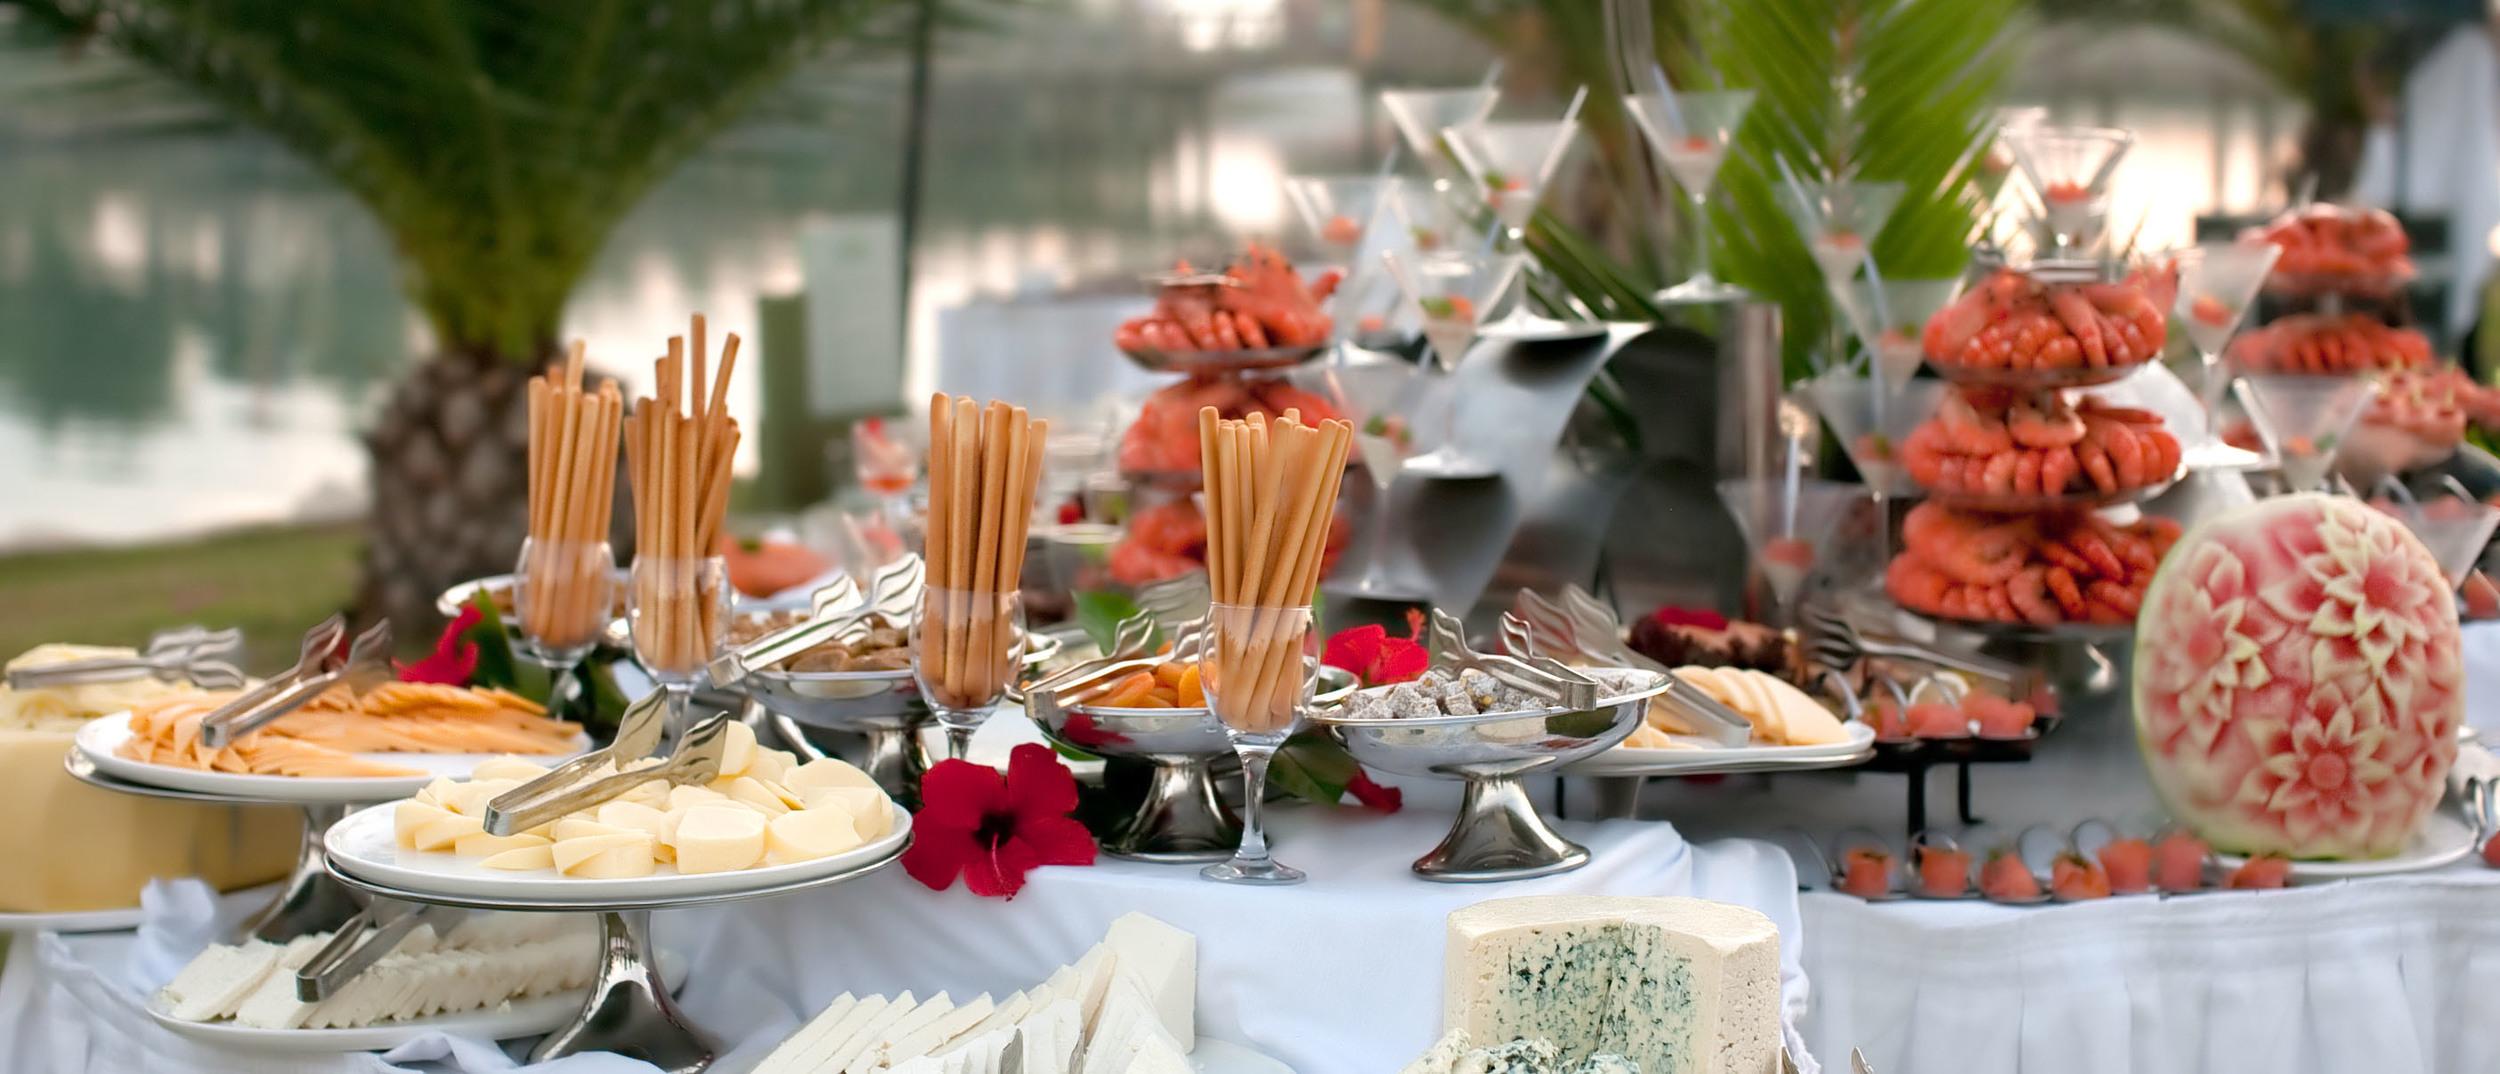 wedding catering dallas.jpg